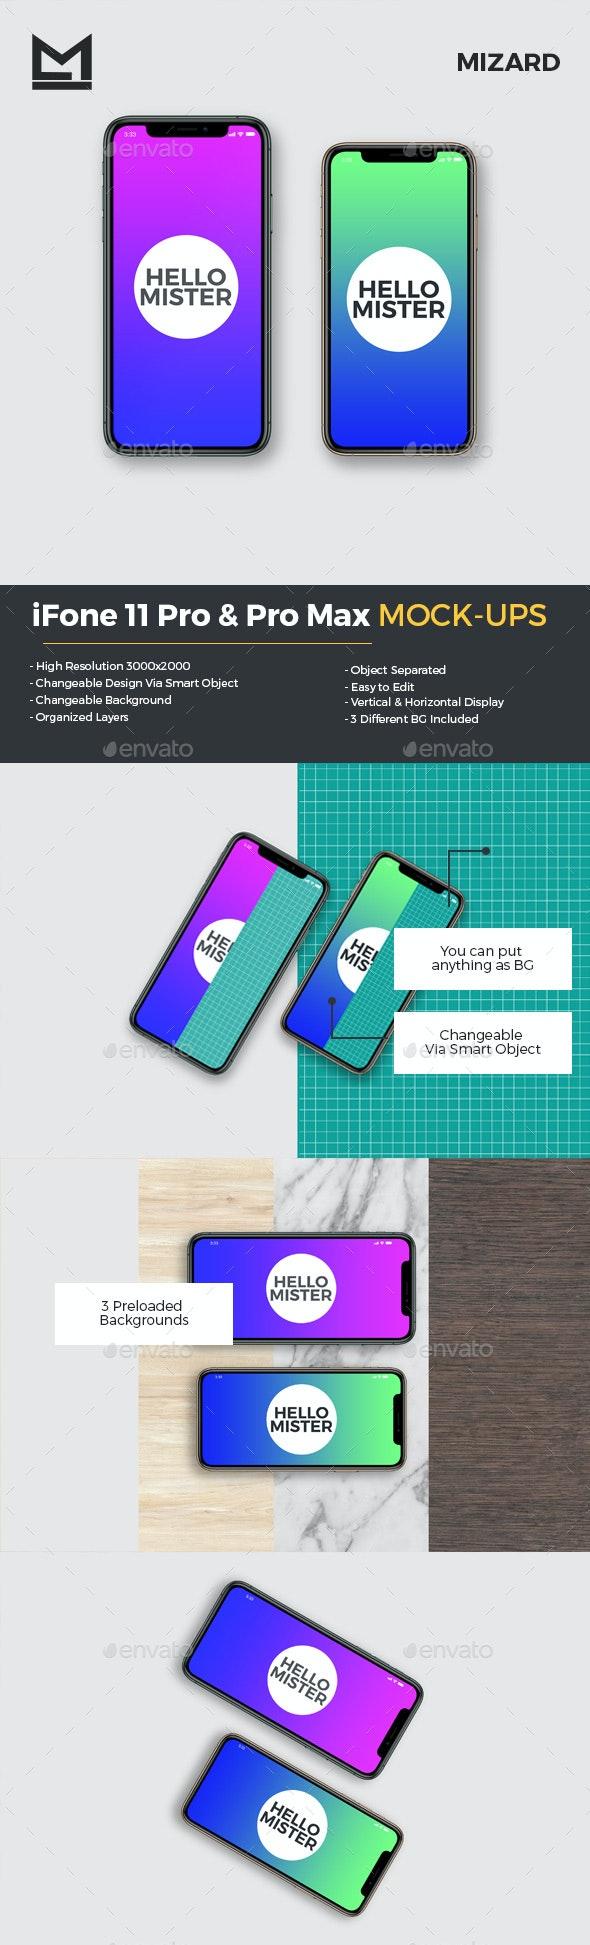 iFone 11 Pro & Pro Max Mockup - Mobile Displays